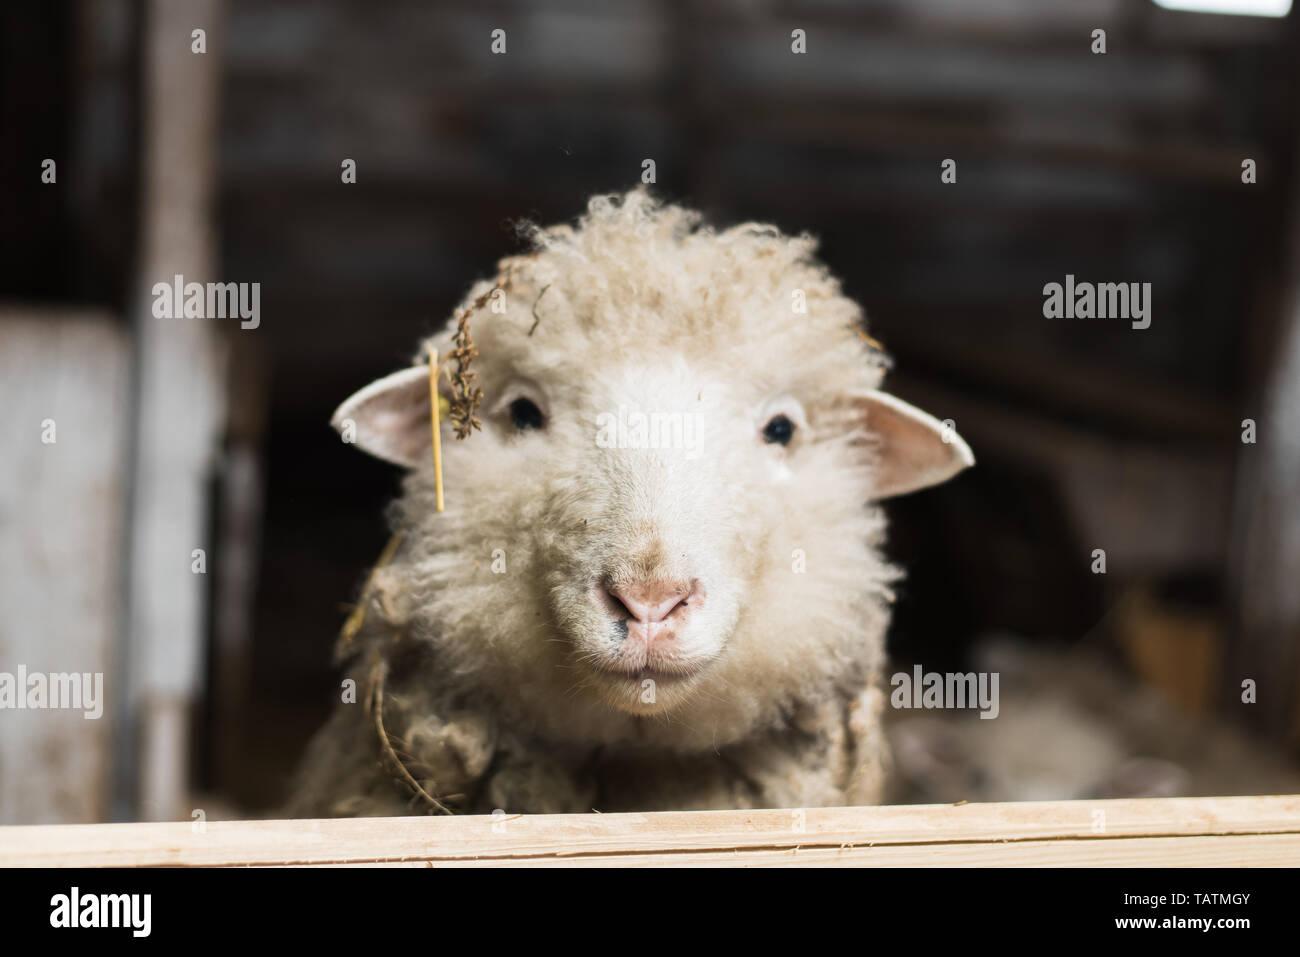 A cute little lamb looks into the camera. A sheep with plenty of wool looks into the camera on the uniform Stock Photo